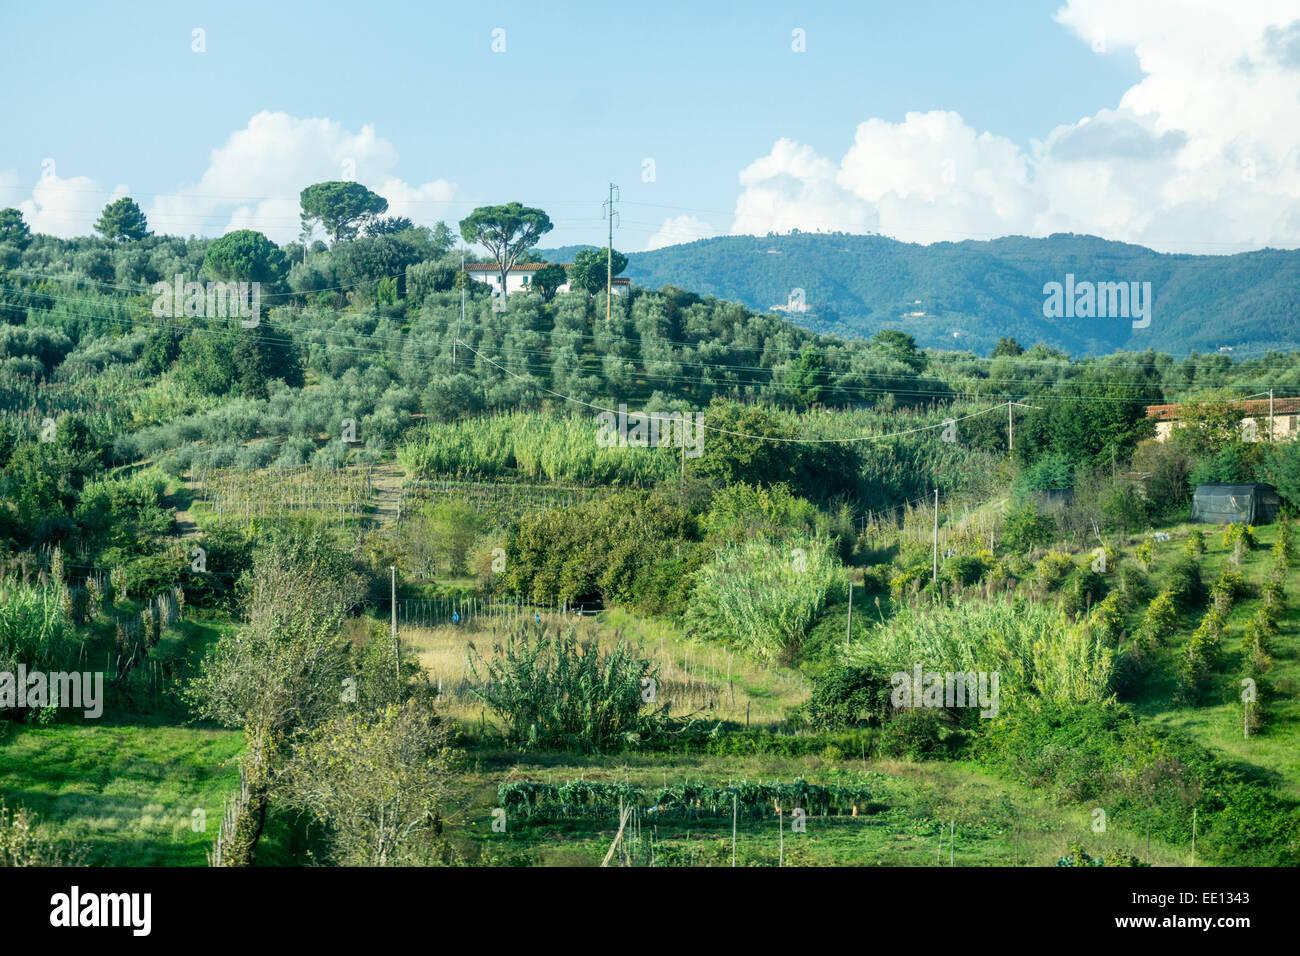 Case Rurali Toscane : Delicatamente ondulate rurale toscana colline collina collina con